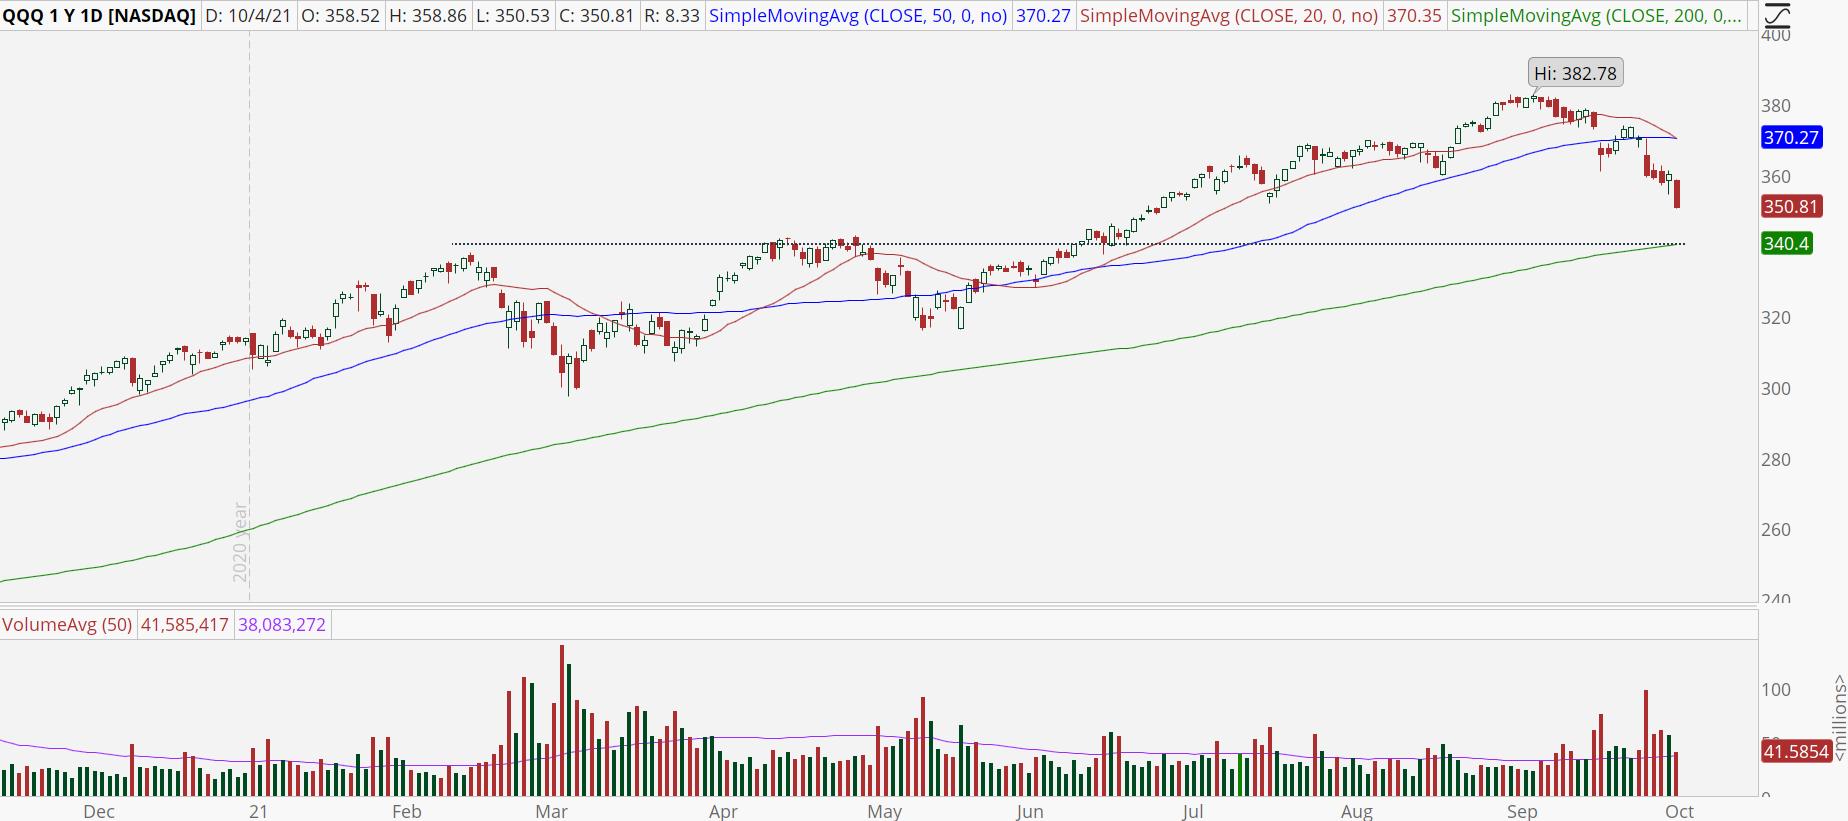 Invesco QQQ Trust Series 1 (QQQ) stock chart with downtrend